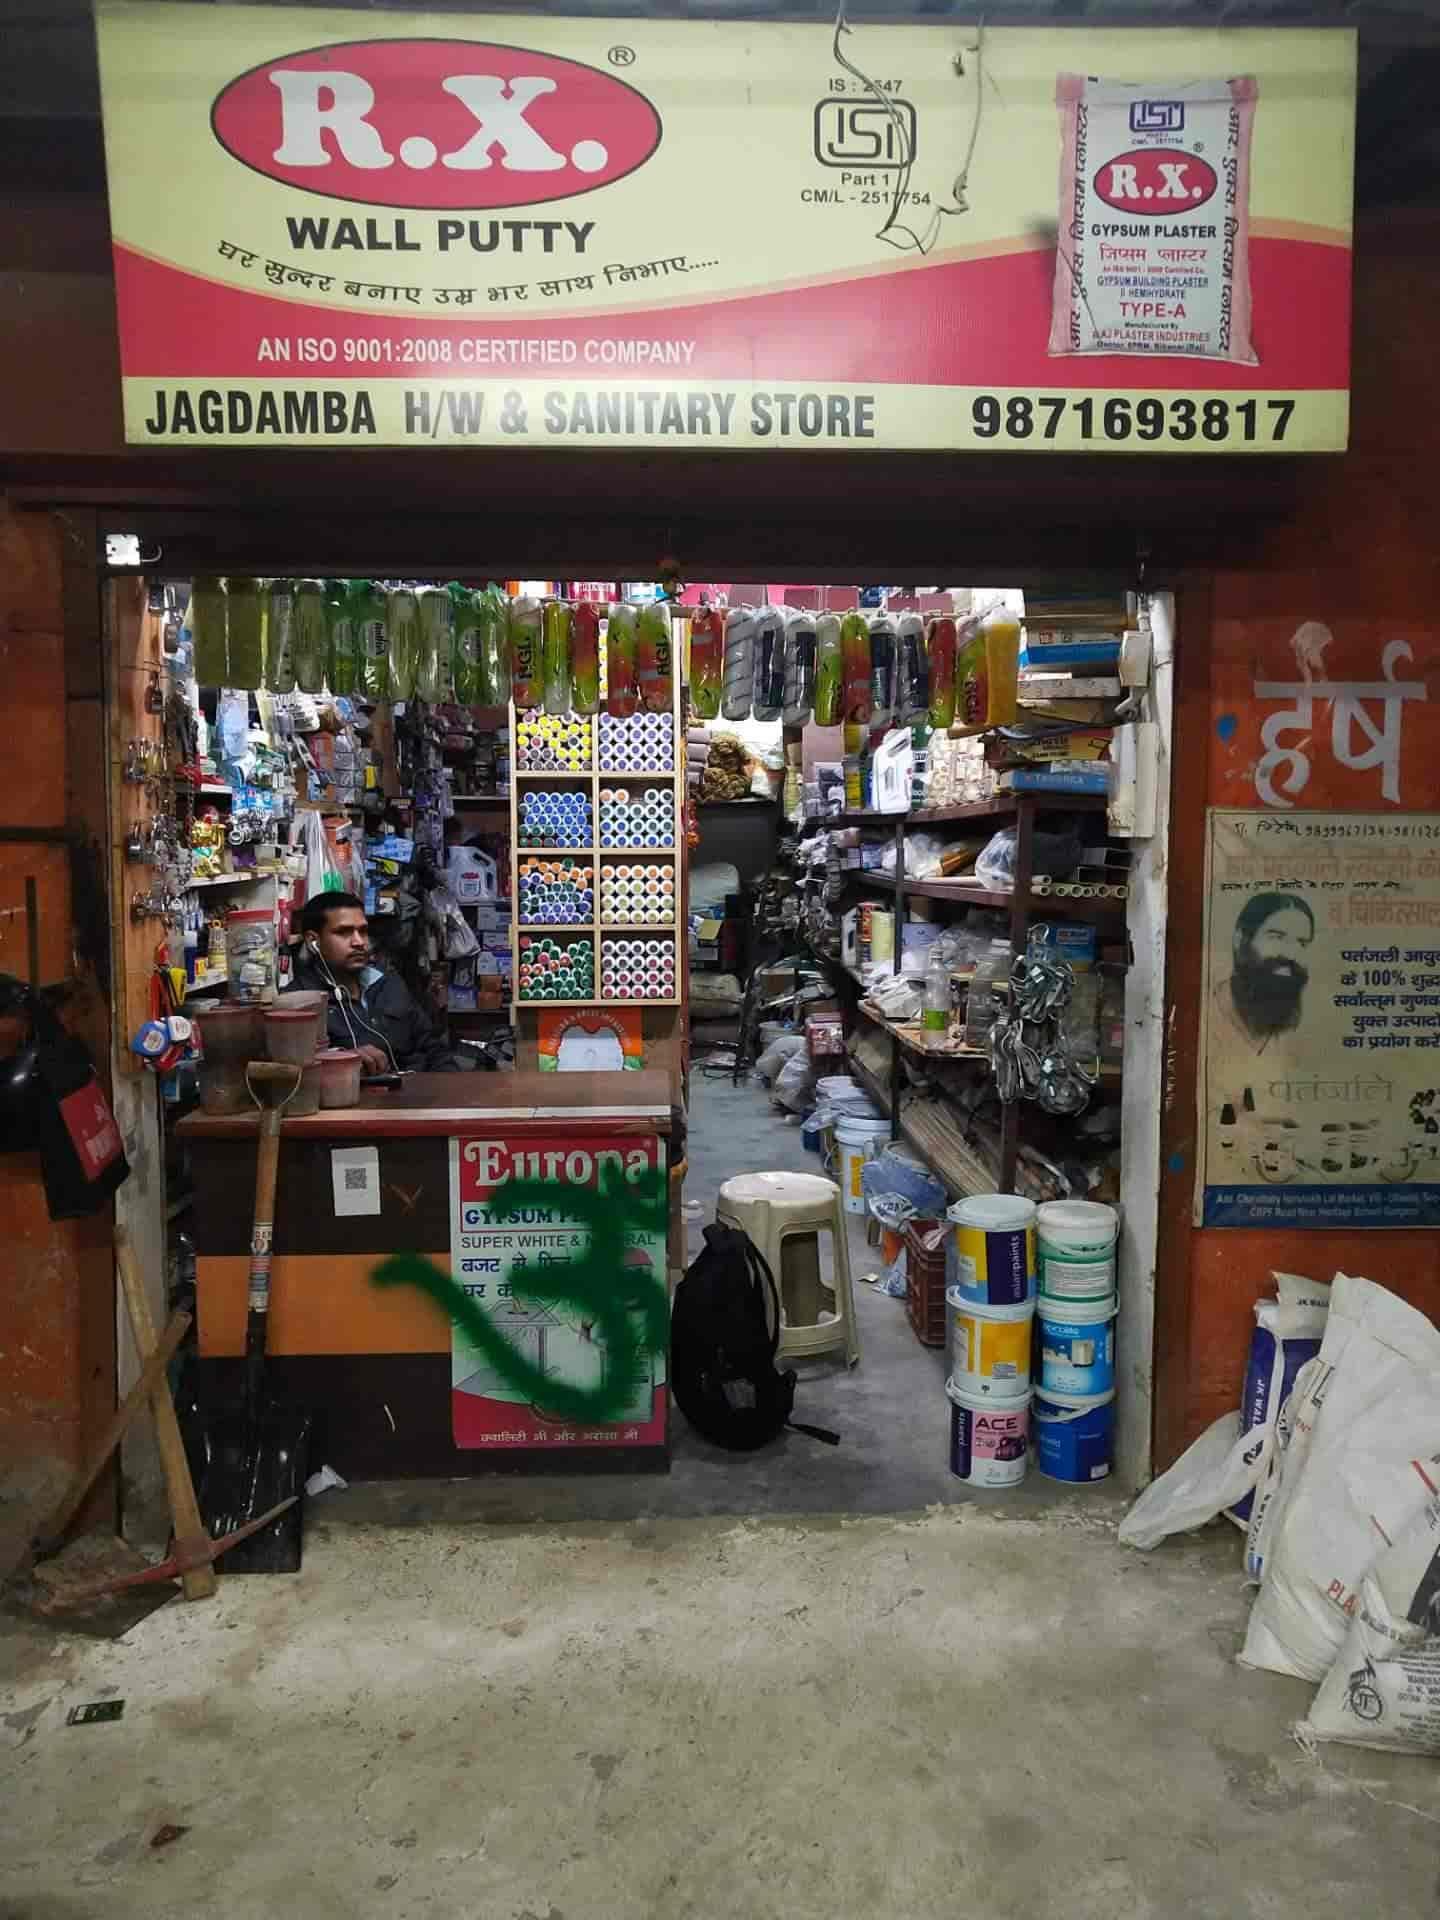 Jagdamba Hardware & Sanitary Store, Gurgaon Sector 62